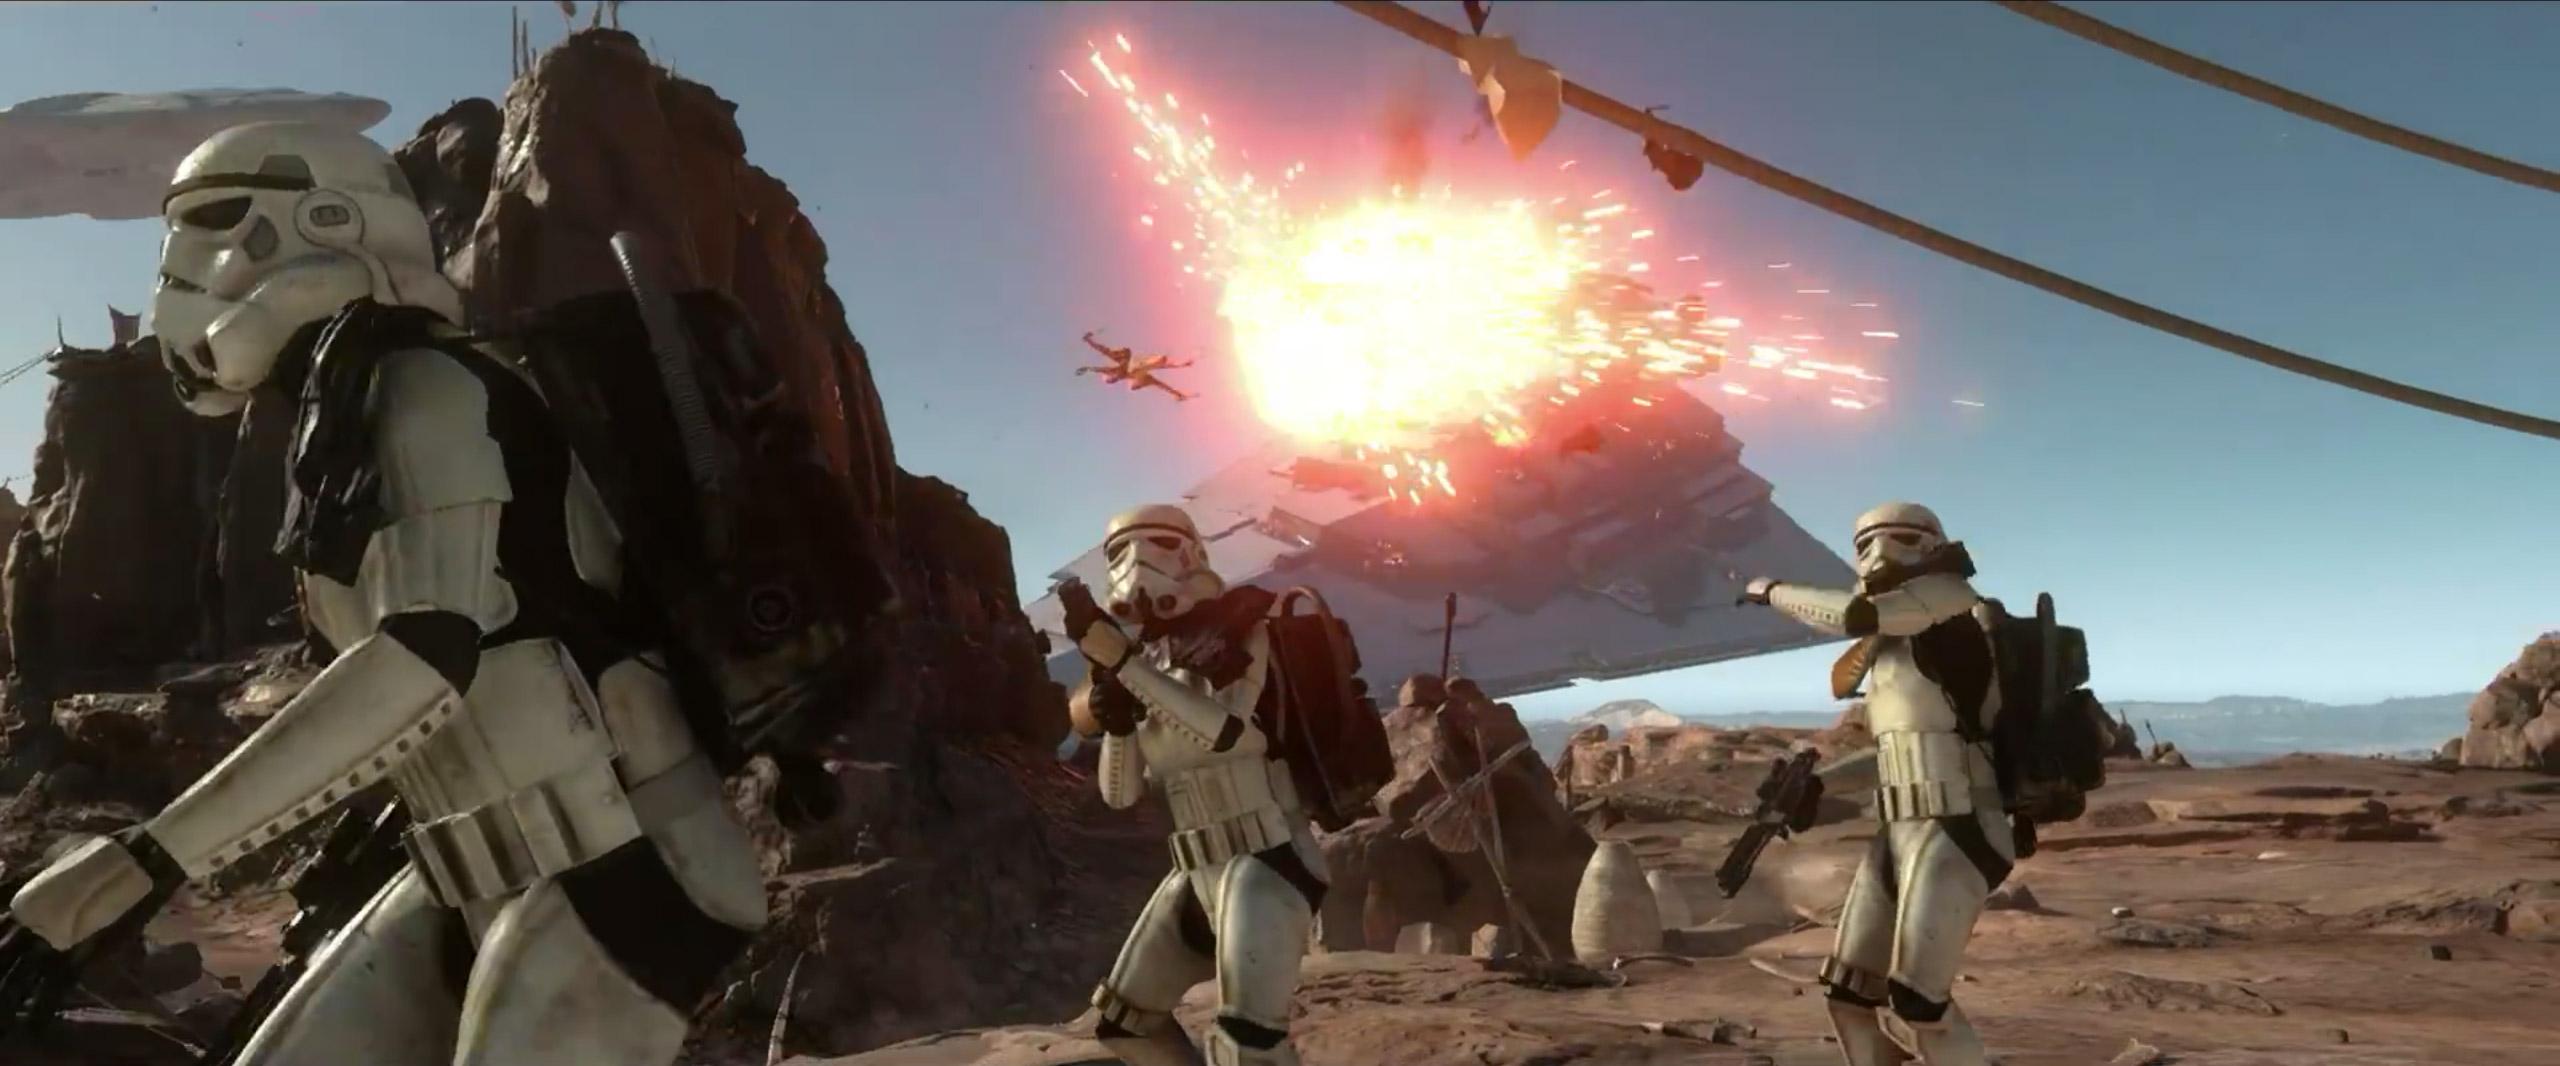 Star Wars Stormtroopers Fantasy Art Artwork Bwing Down: Star Wars Battlefront Gameplay Videos